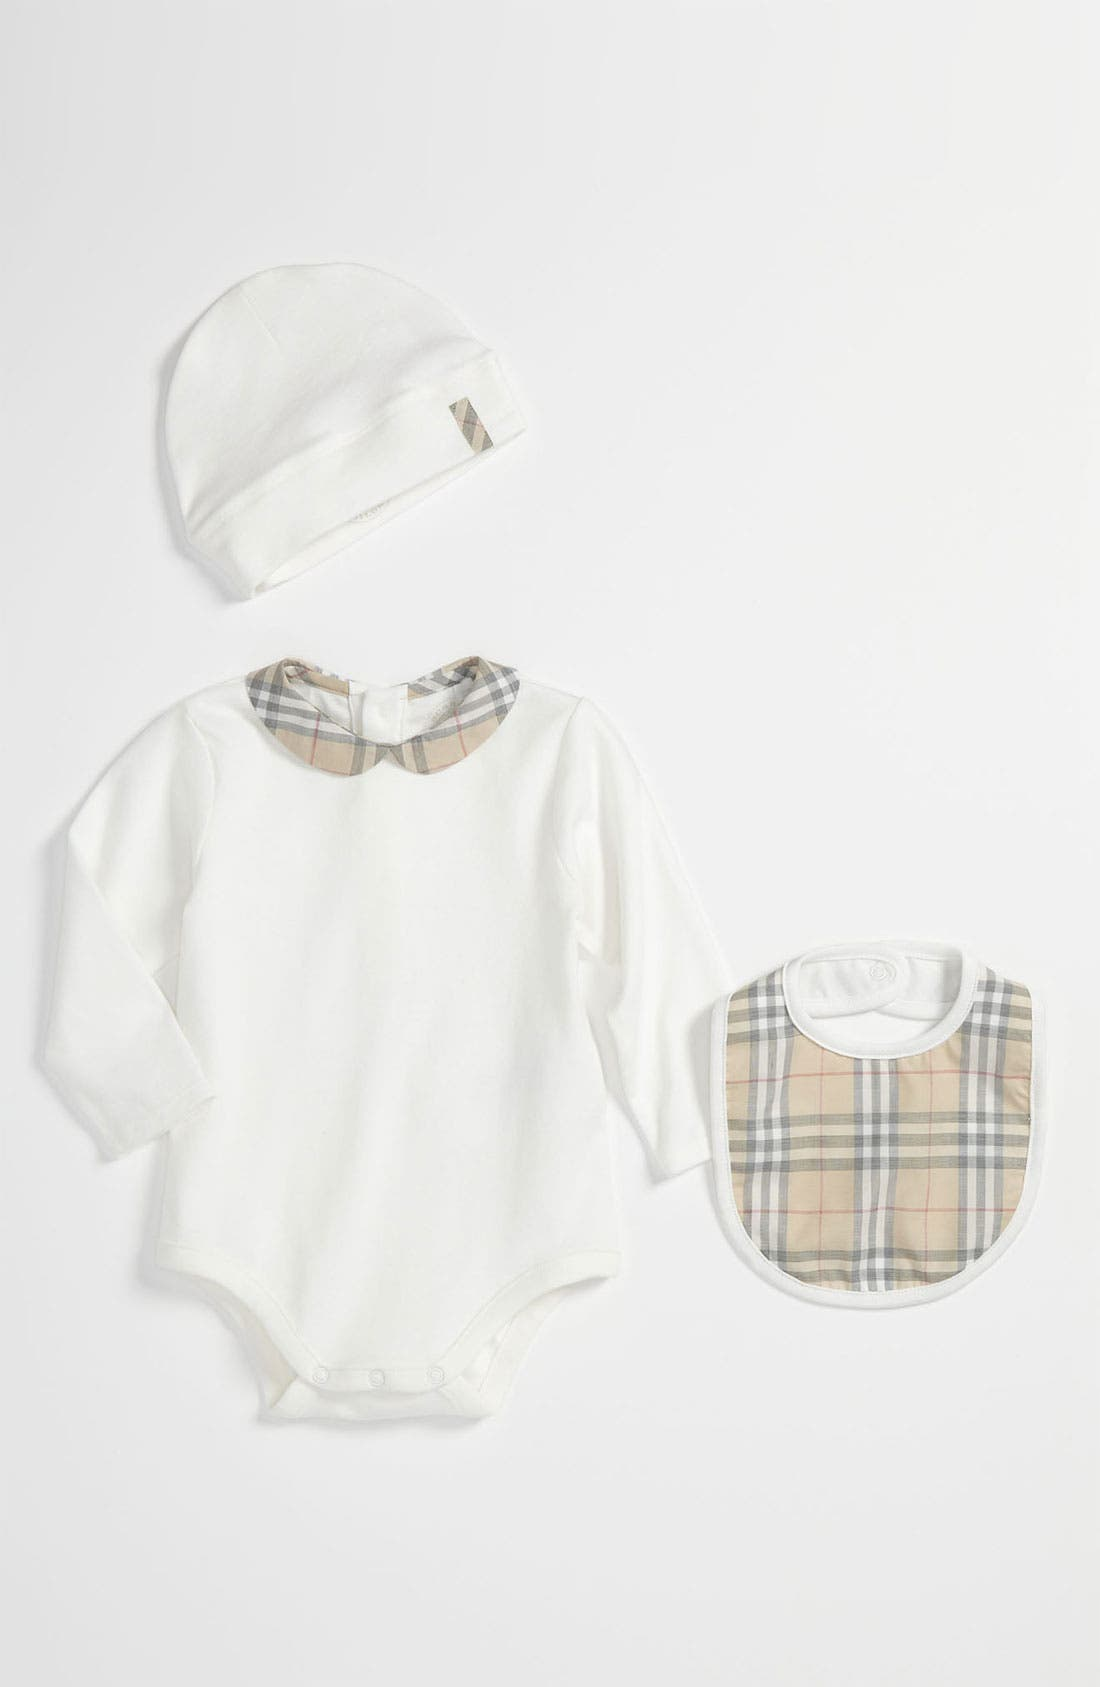 Main Image - Burberry Bodysuit, Hat & Bib Set (Baby)